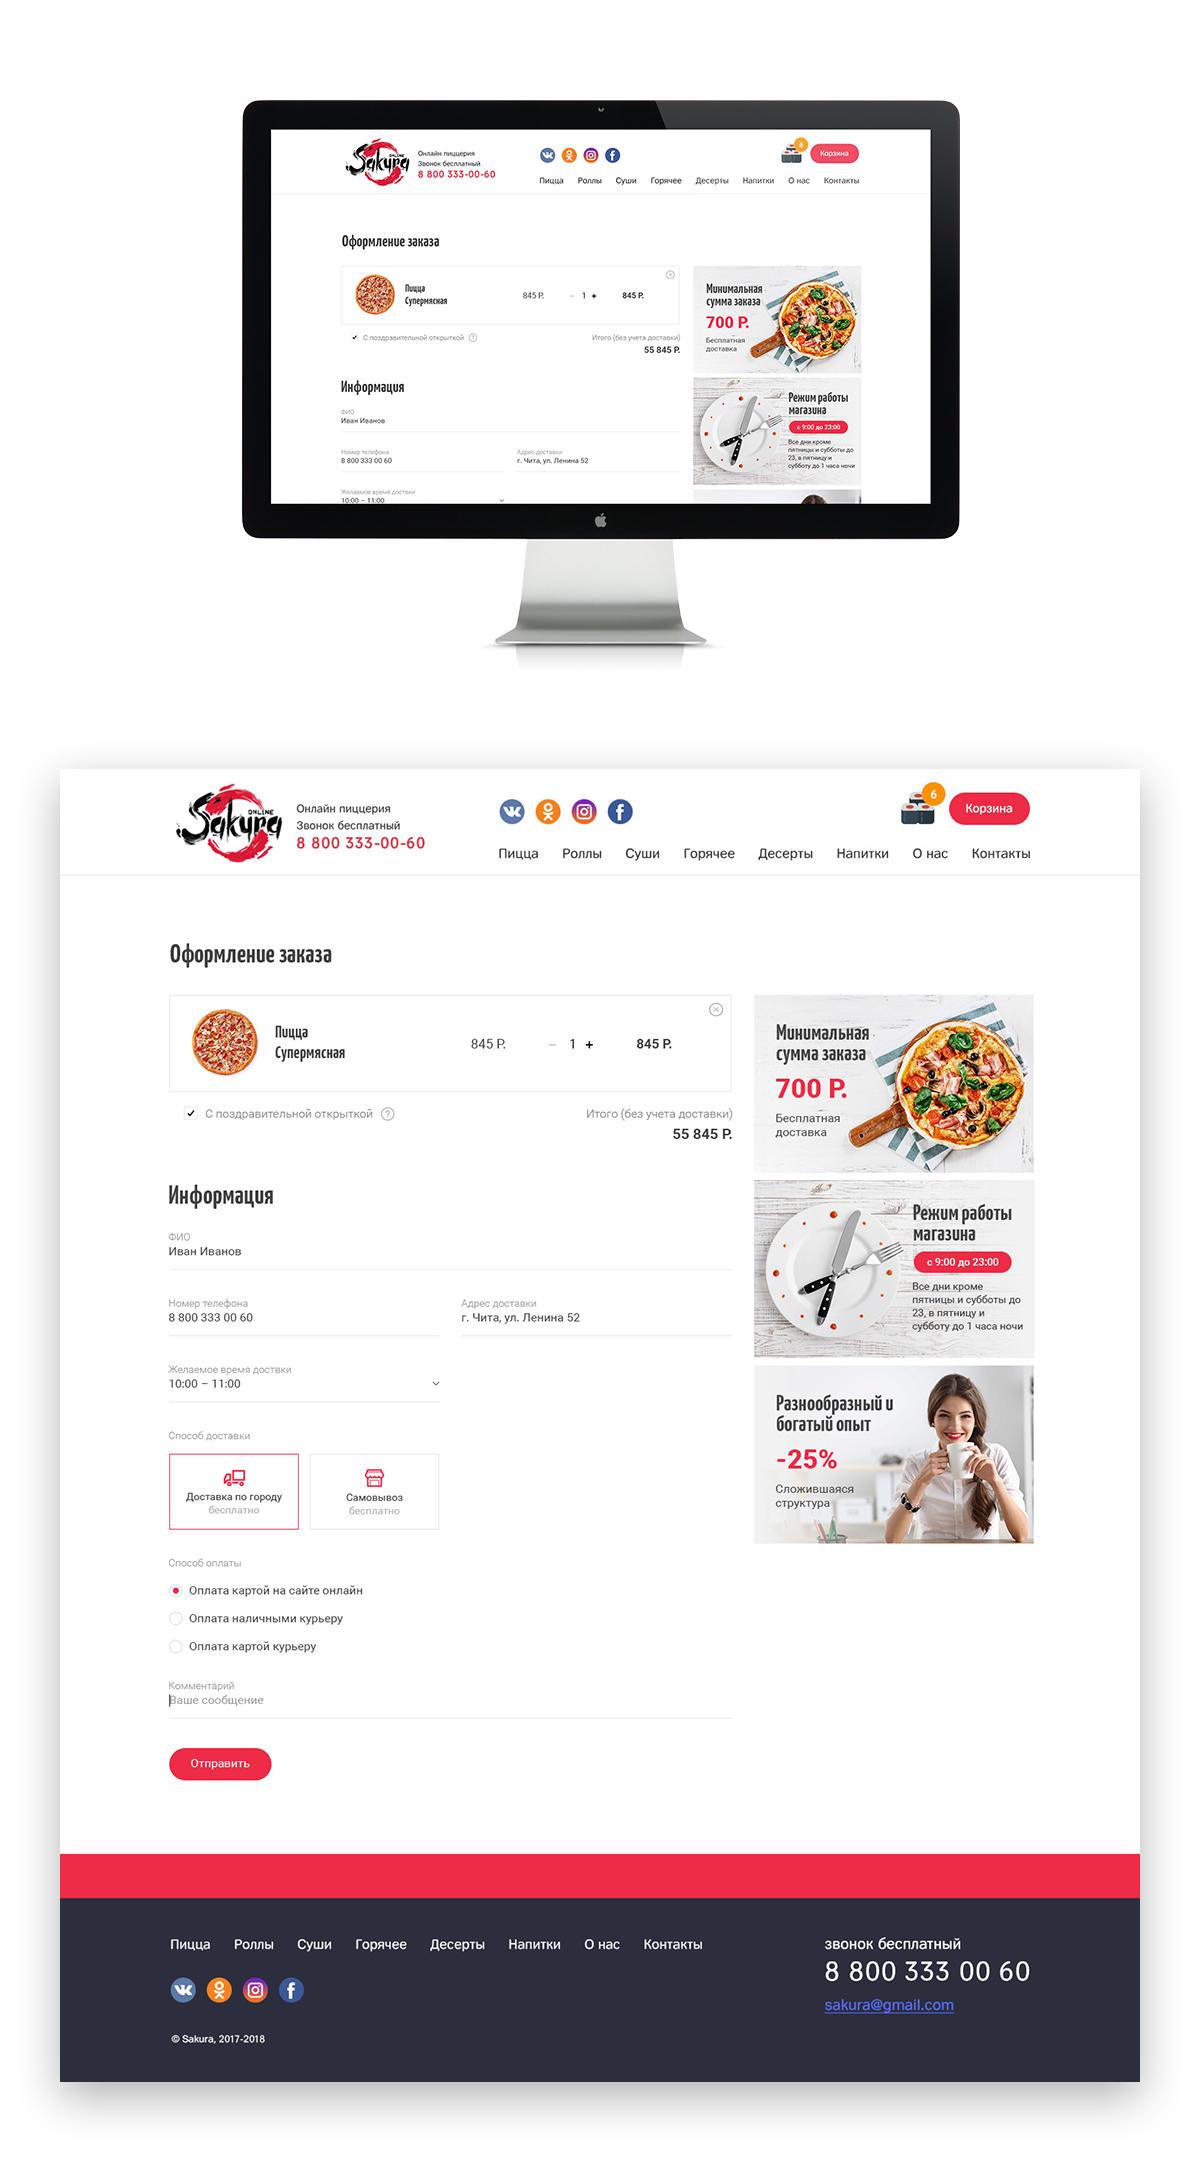 "Страница оформления заказа онлайн пиццерии ""Sakura"""